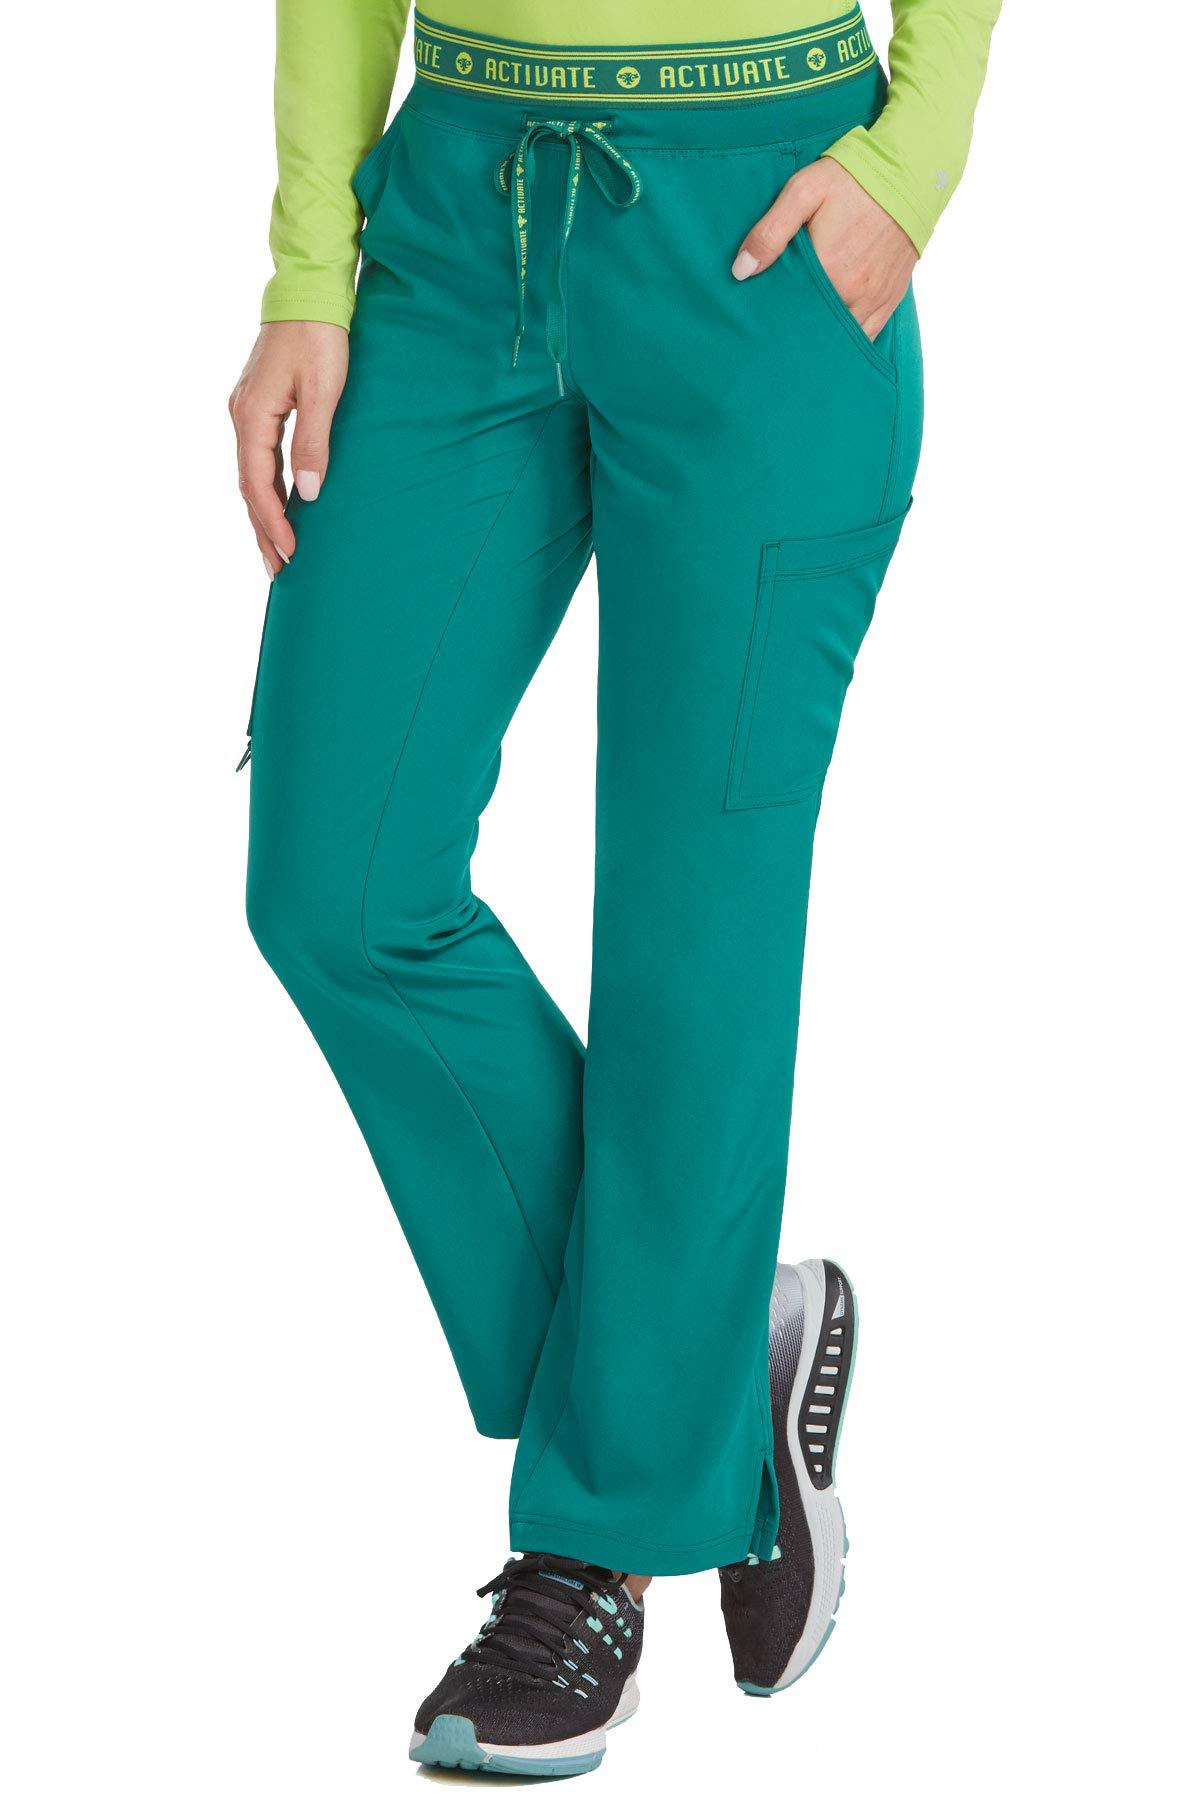 Med Couture Activate Scrub Pants Women, Flow Yoga 2 Cargo Pocket Pant, Hunter, Medium